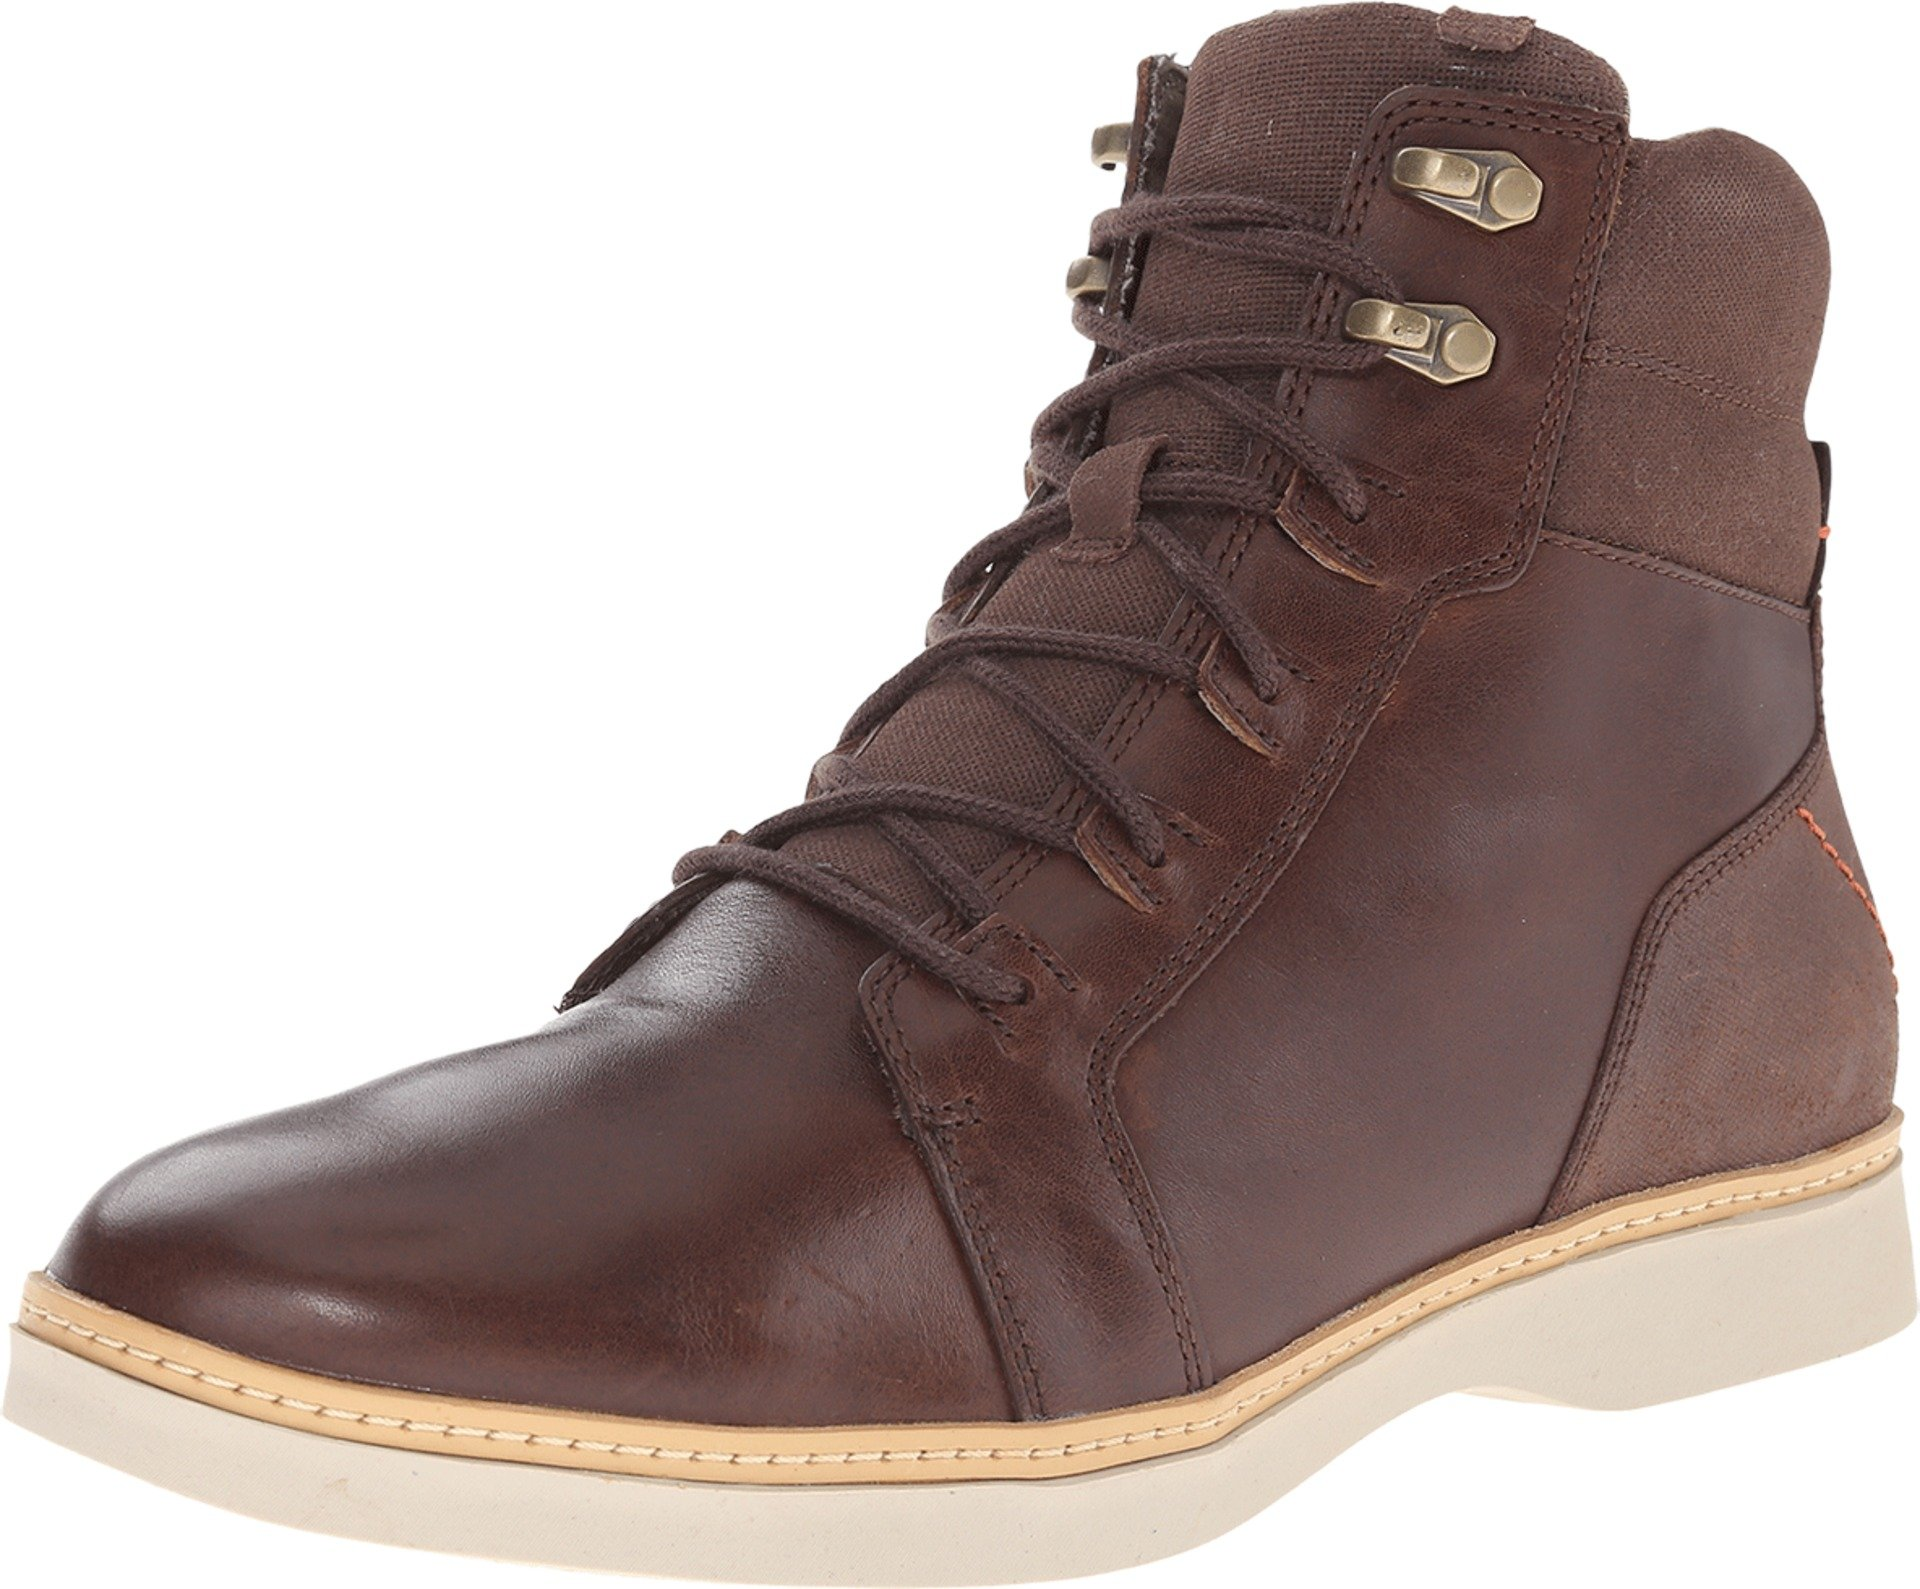 Ahnu Men's Roanoke Dressy 6 Eye Boot, Corduroy, 10 M US